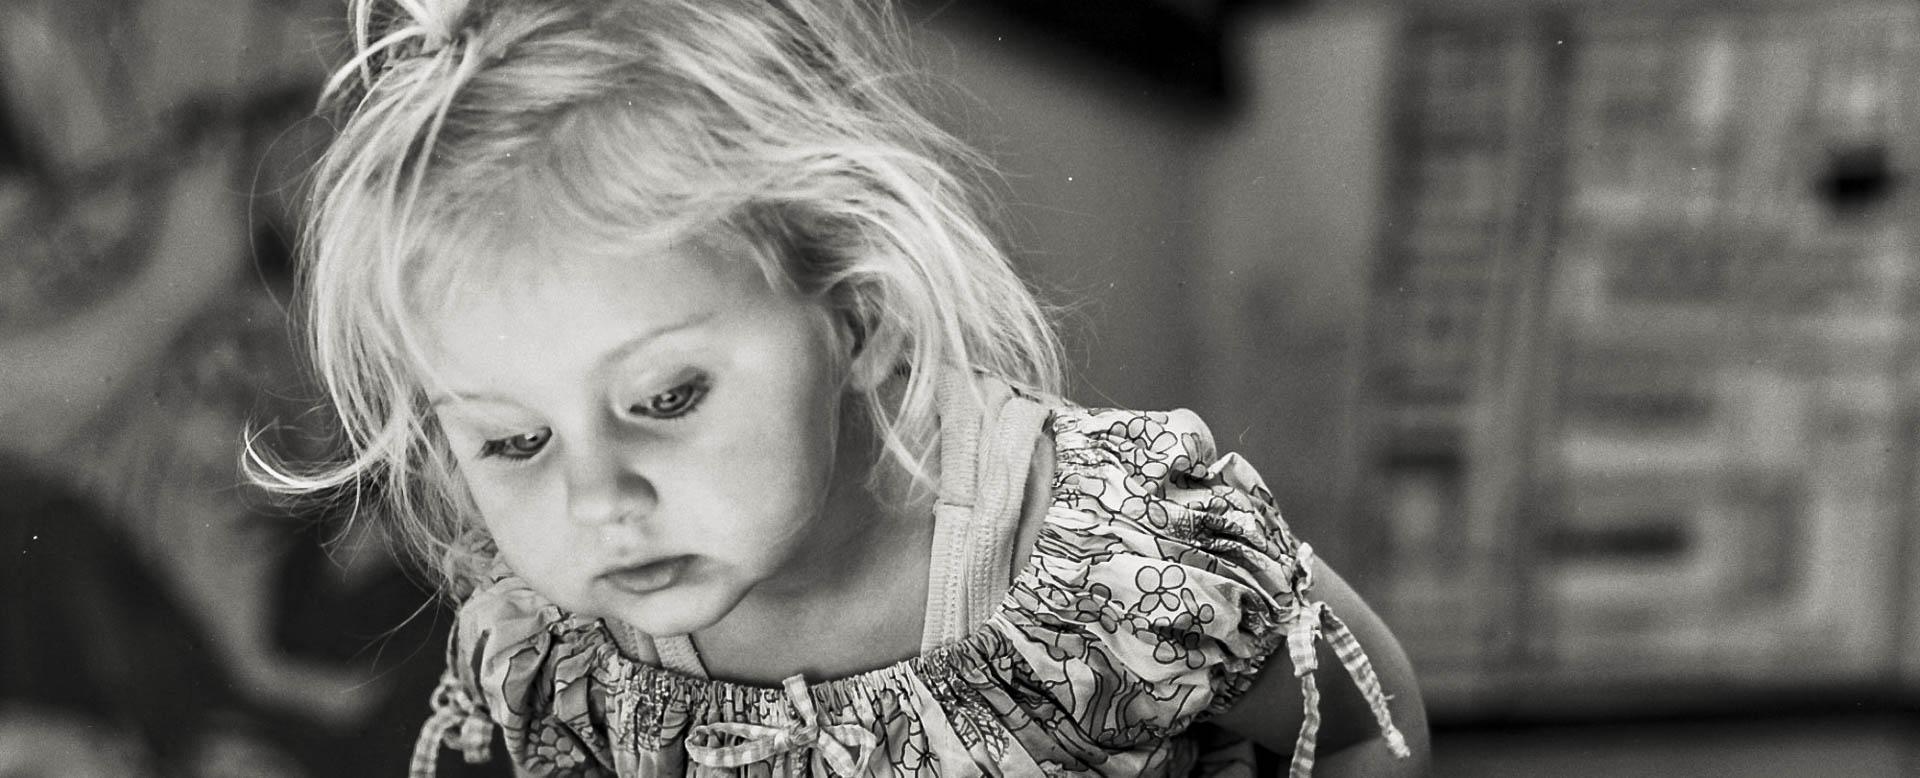 Child Portrait photography Adelaide.